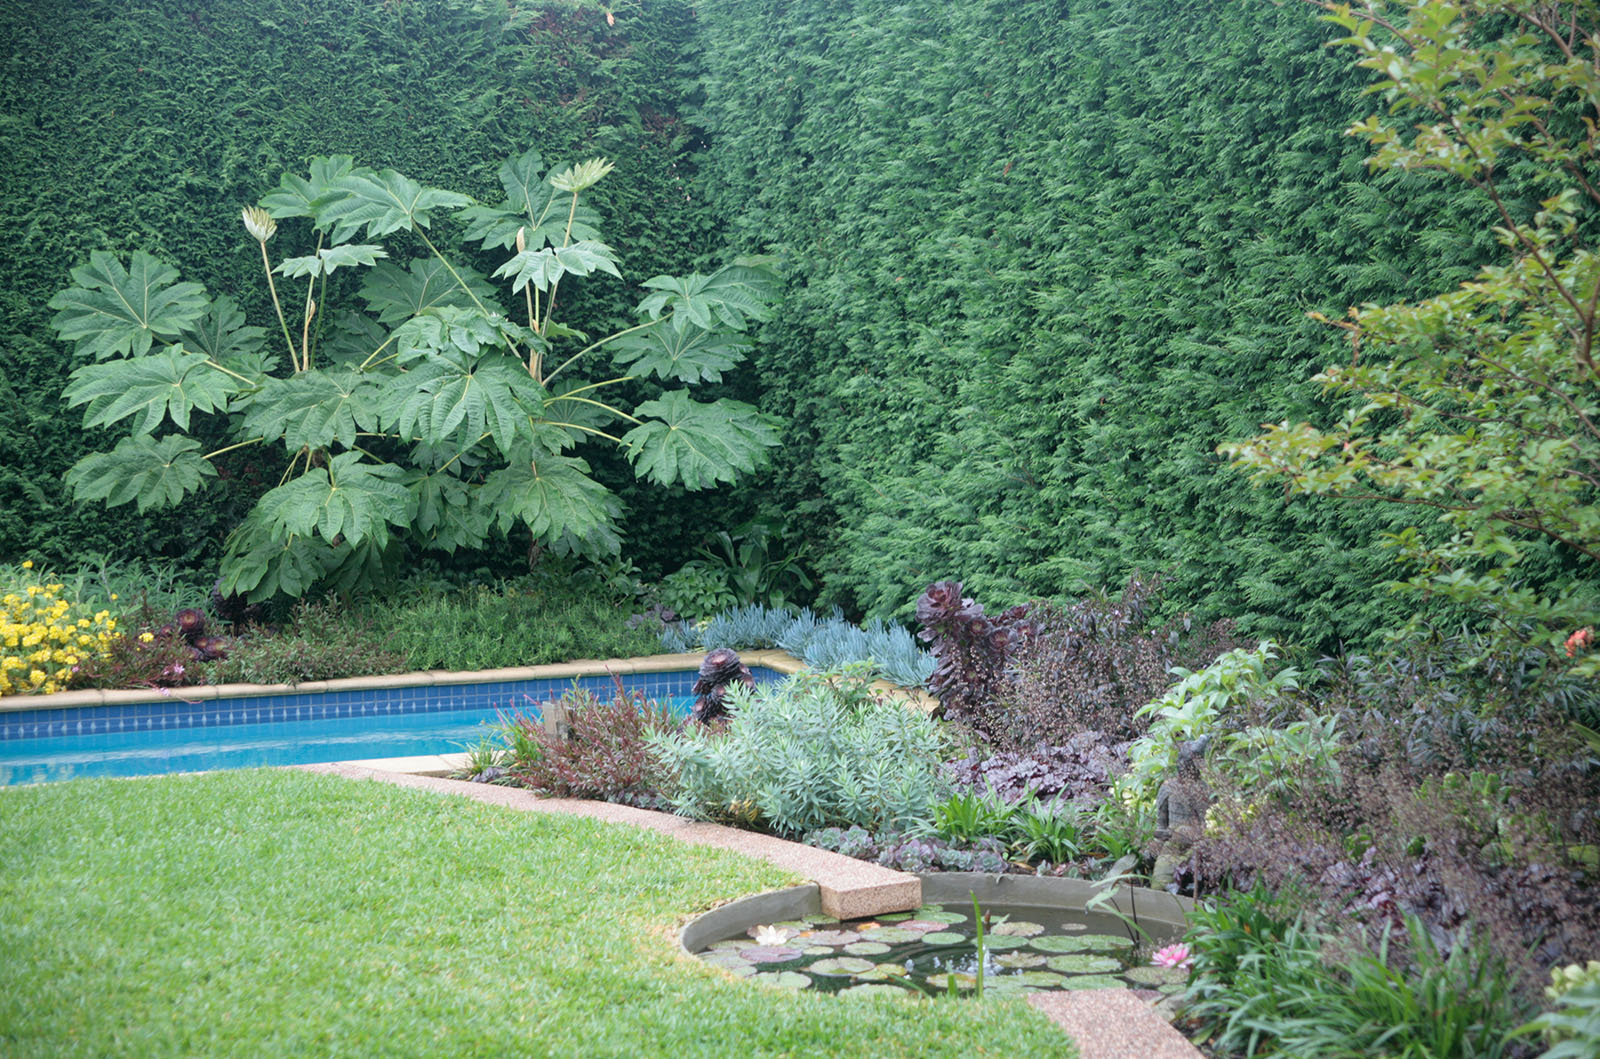 Sculptured Garden_0005s_0009_Hughes 6